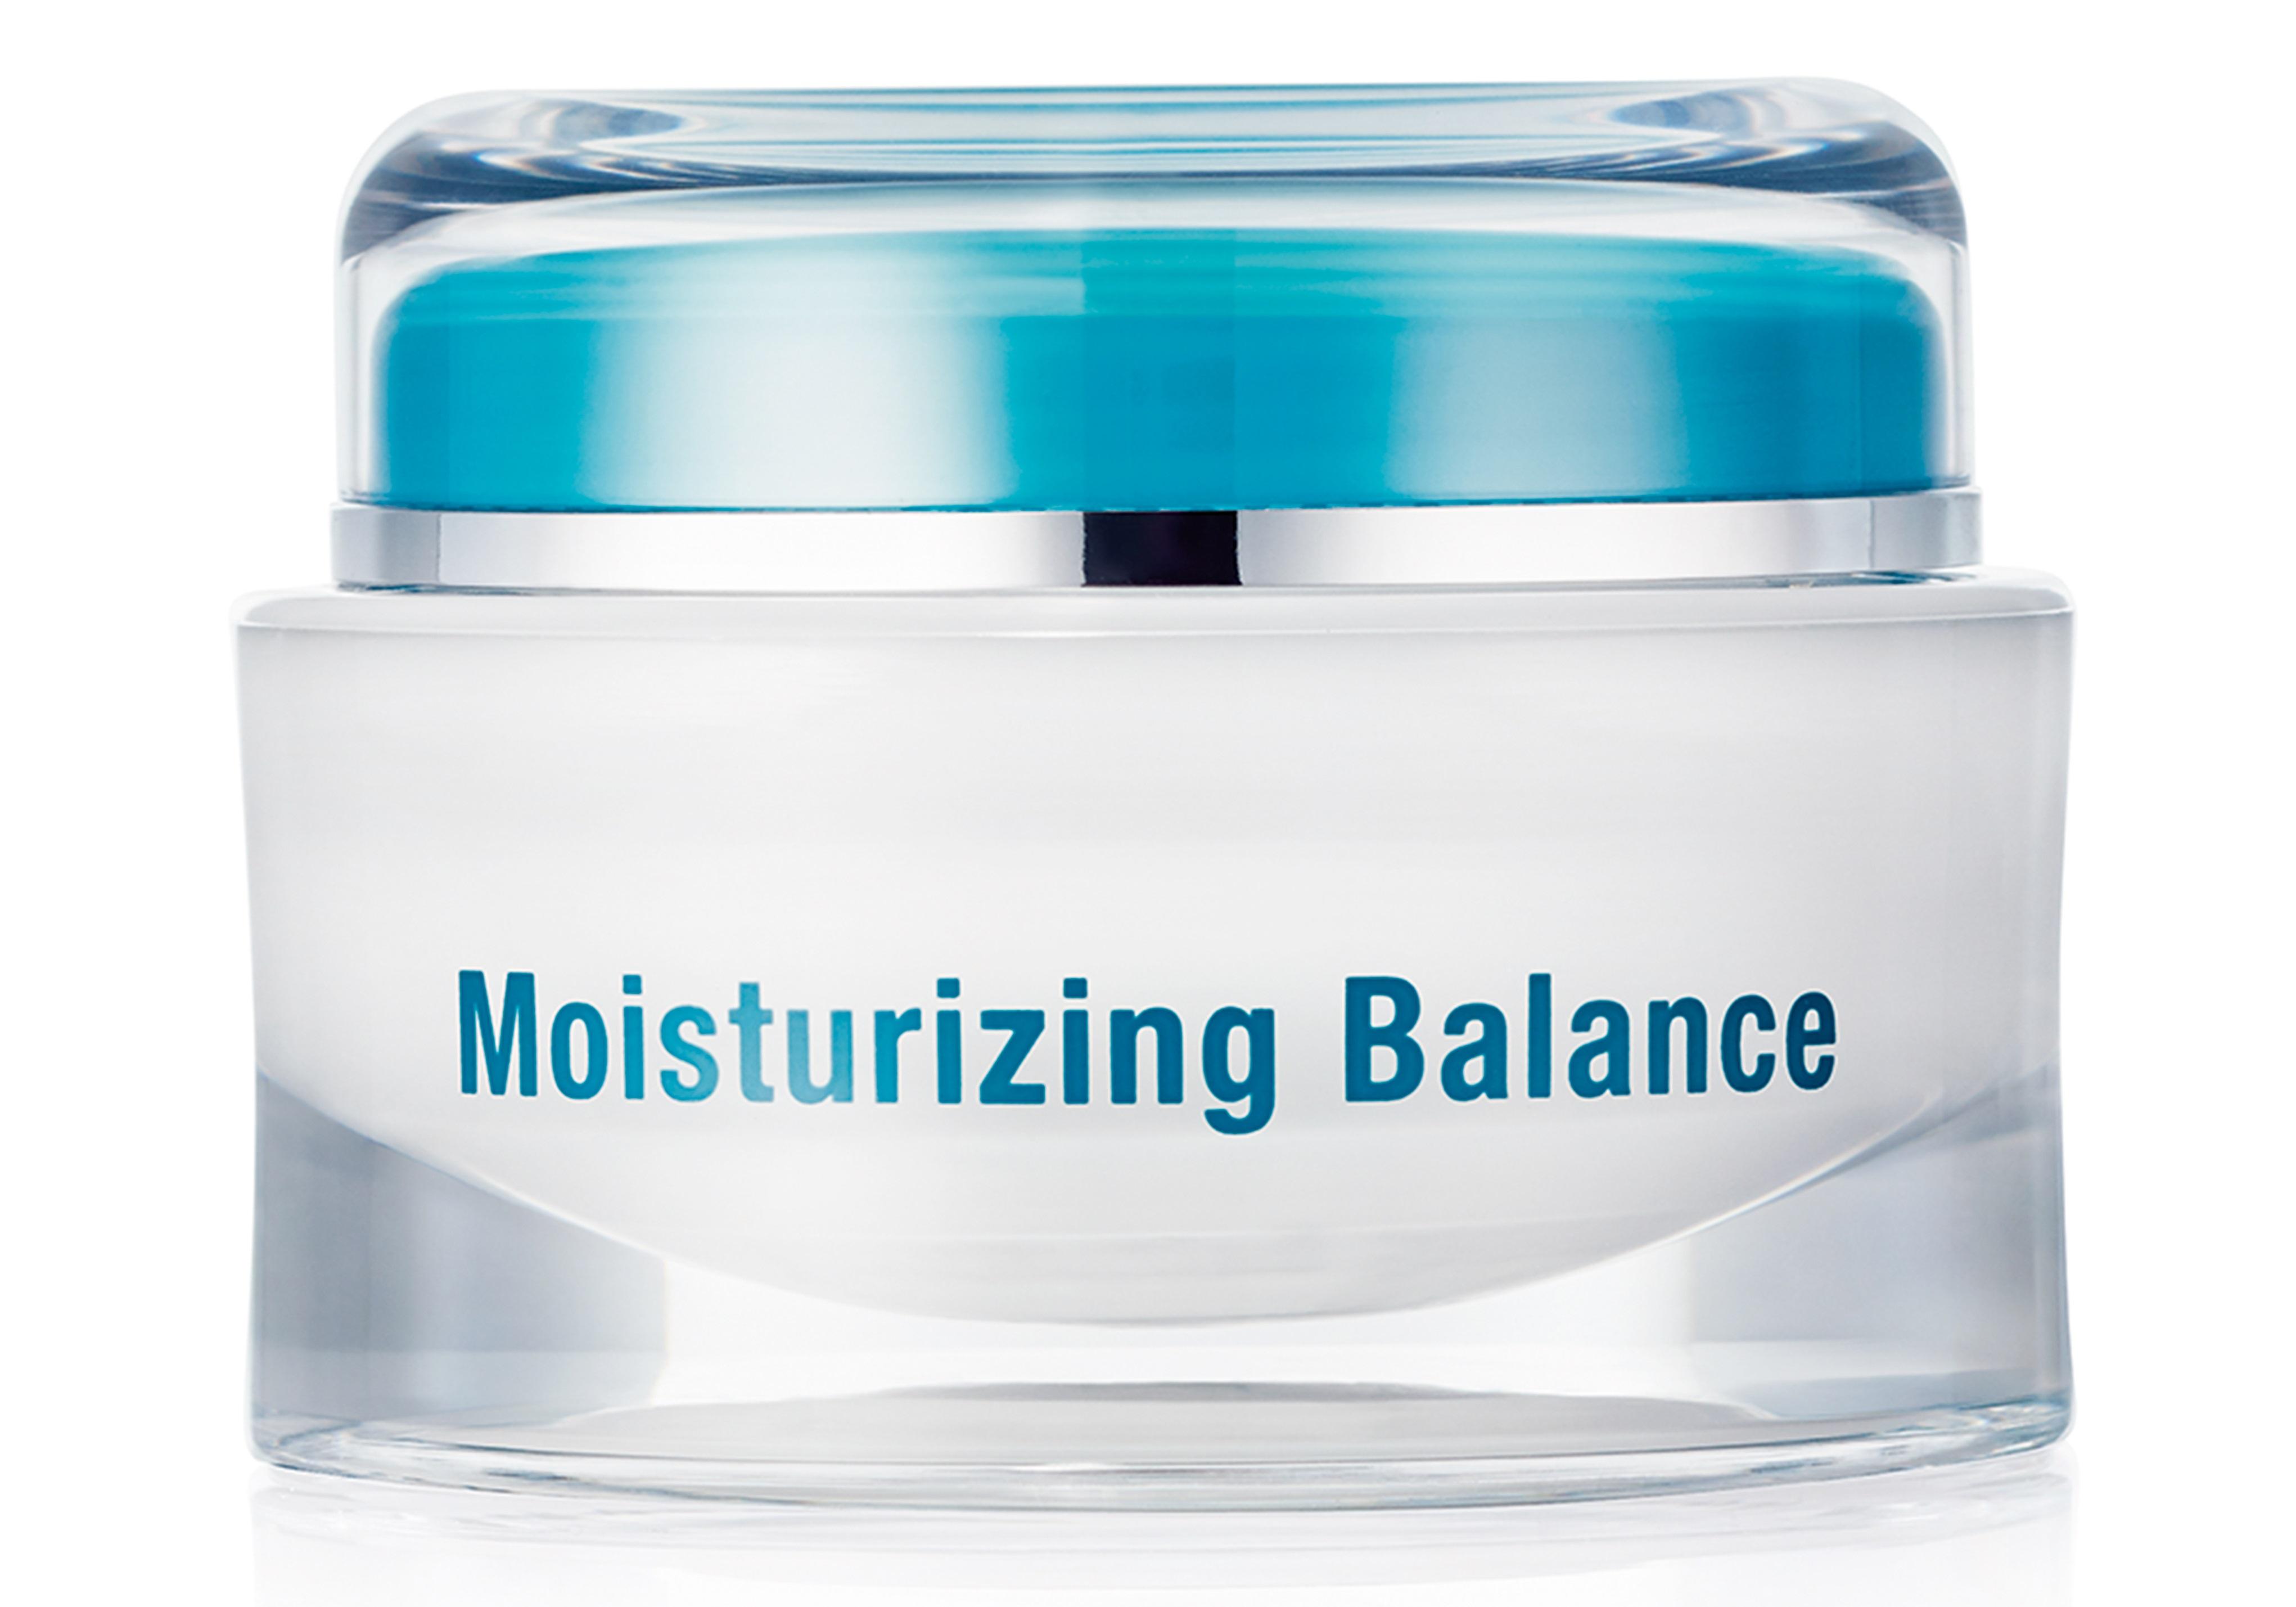 QMS Medicosmetics Moisturizing Balance BeautyandHairdressing